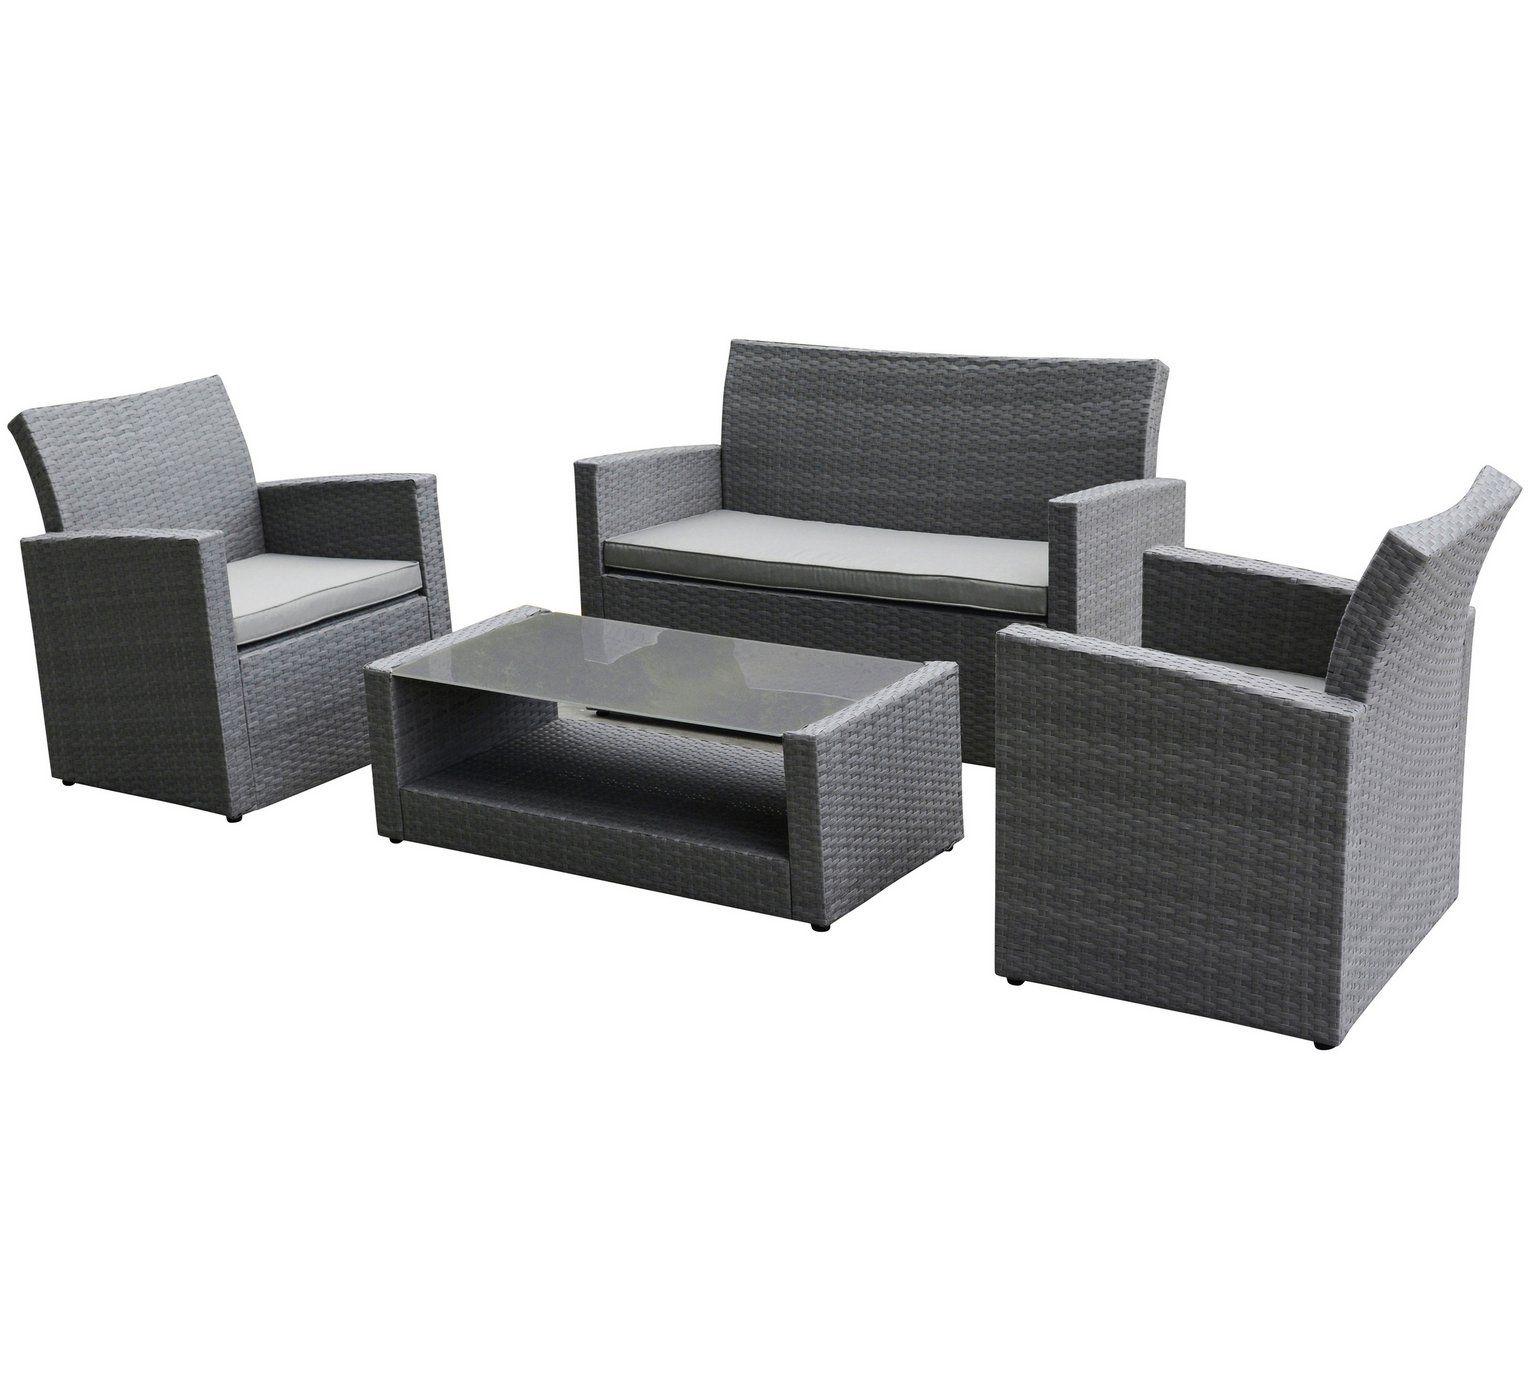 Buy Collection Havana Rattan Effect Grey 4 Seater Sofa Set